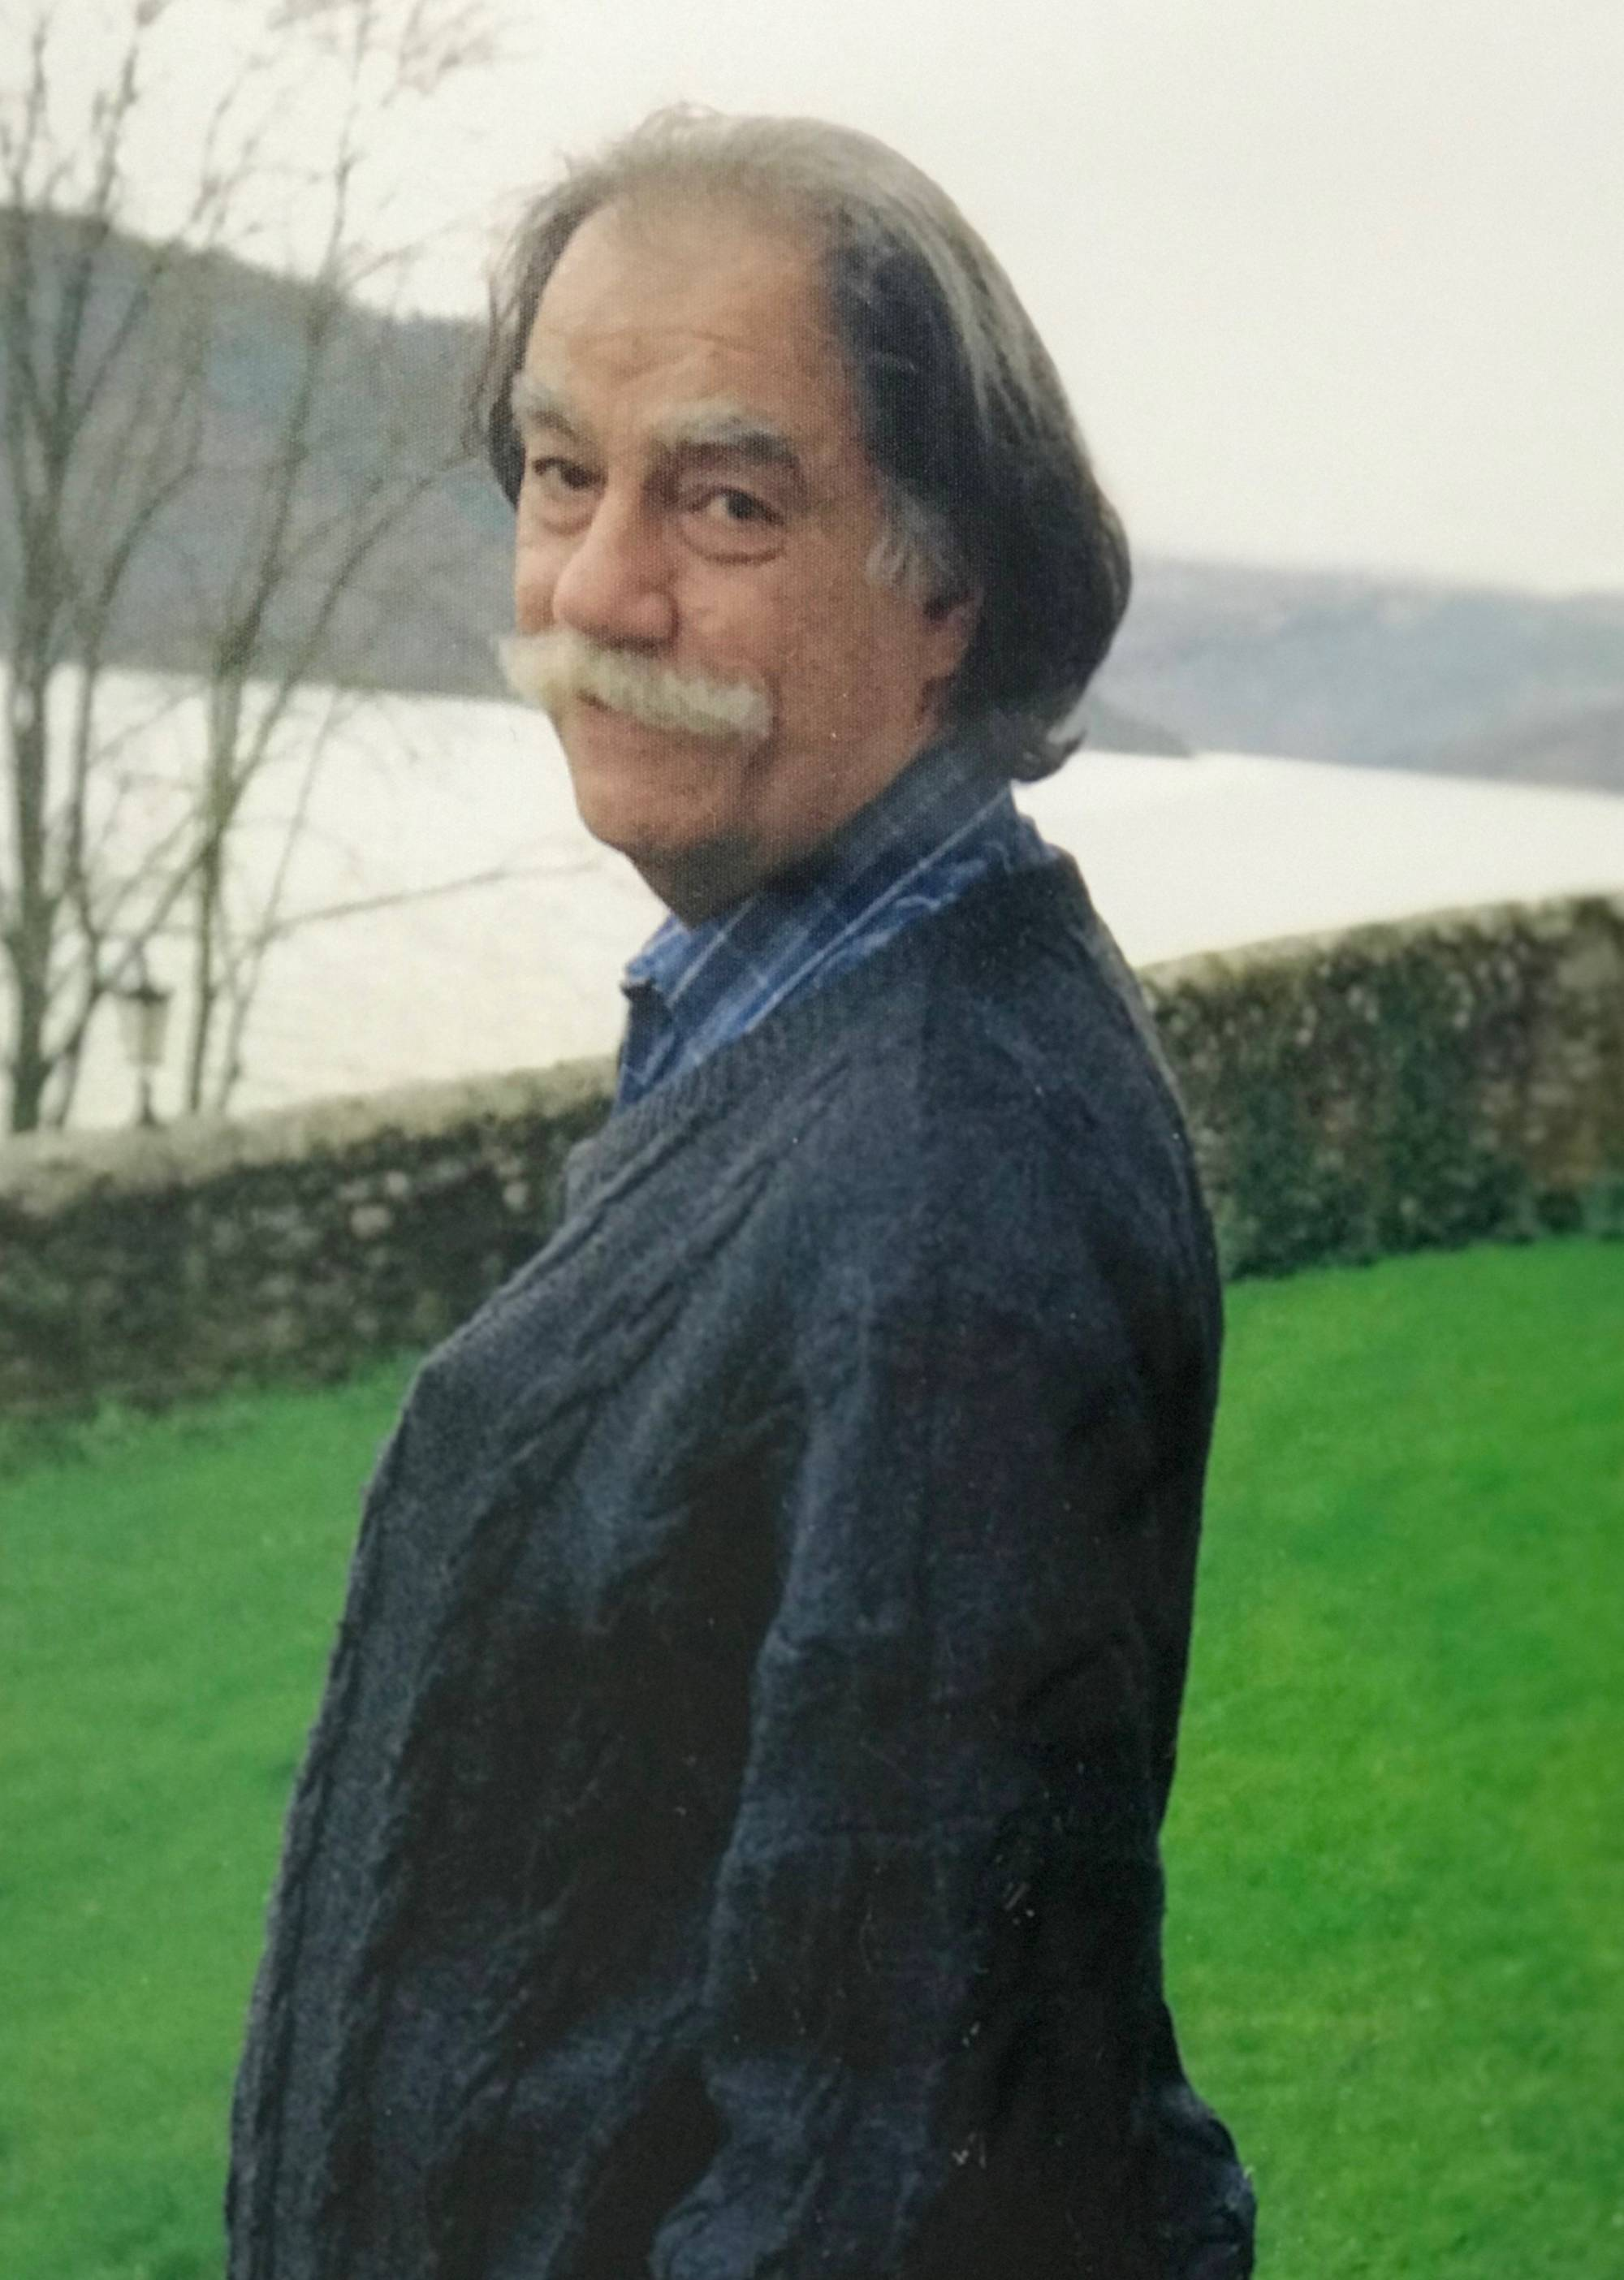 Morteza Momayez ( مرتضی ممیز; August 26, 1935 – October 25, 2005)